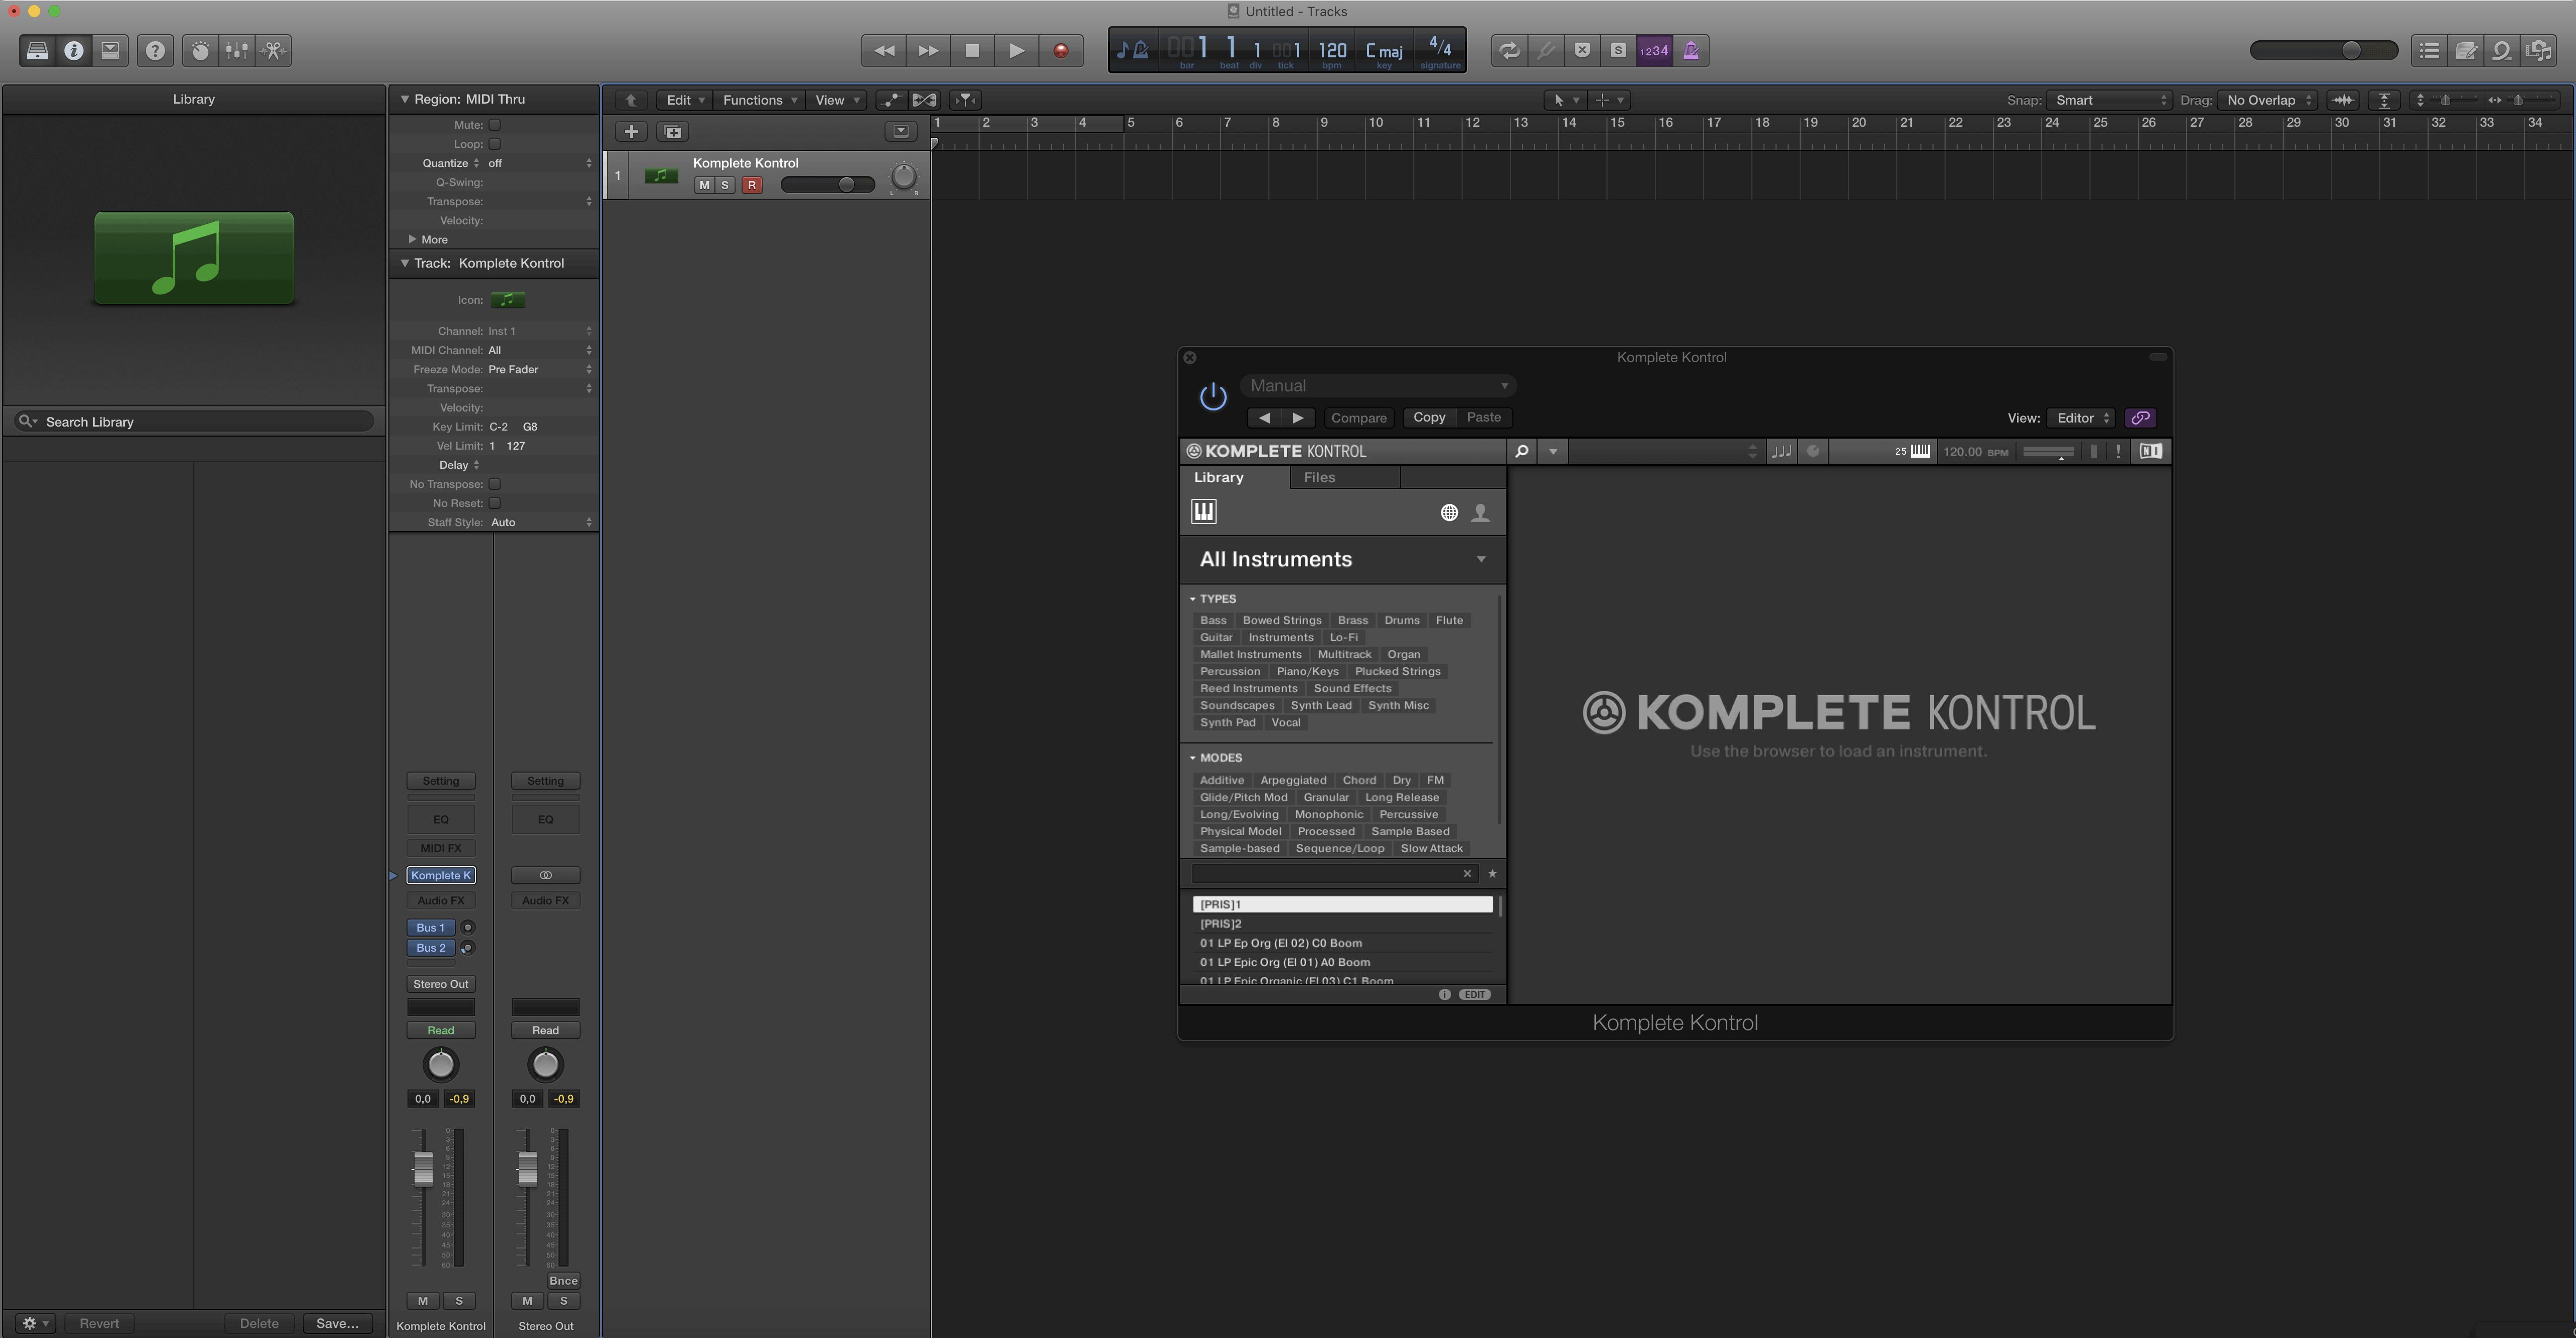 Setup Logic Pro X for using it with KOMPLETE KONTROL